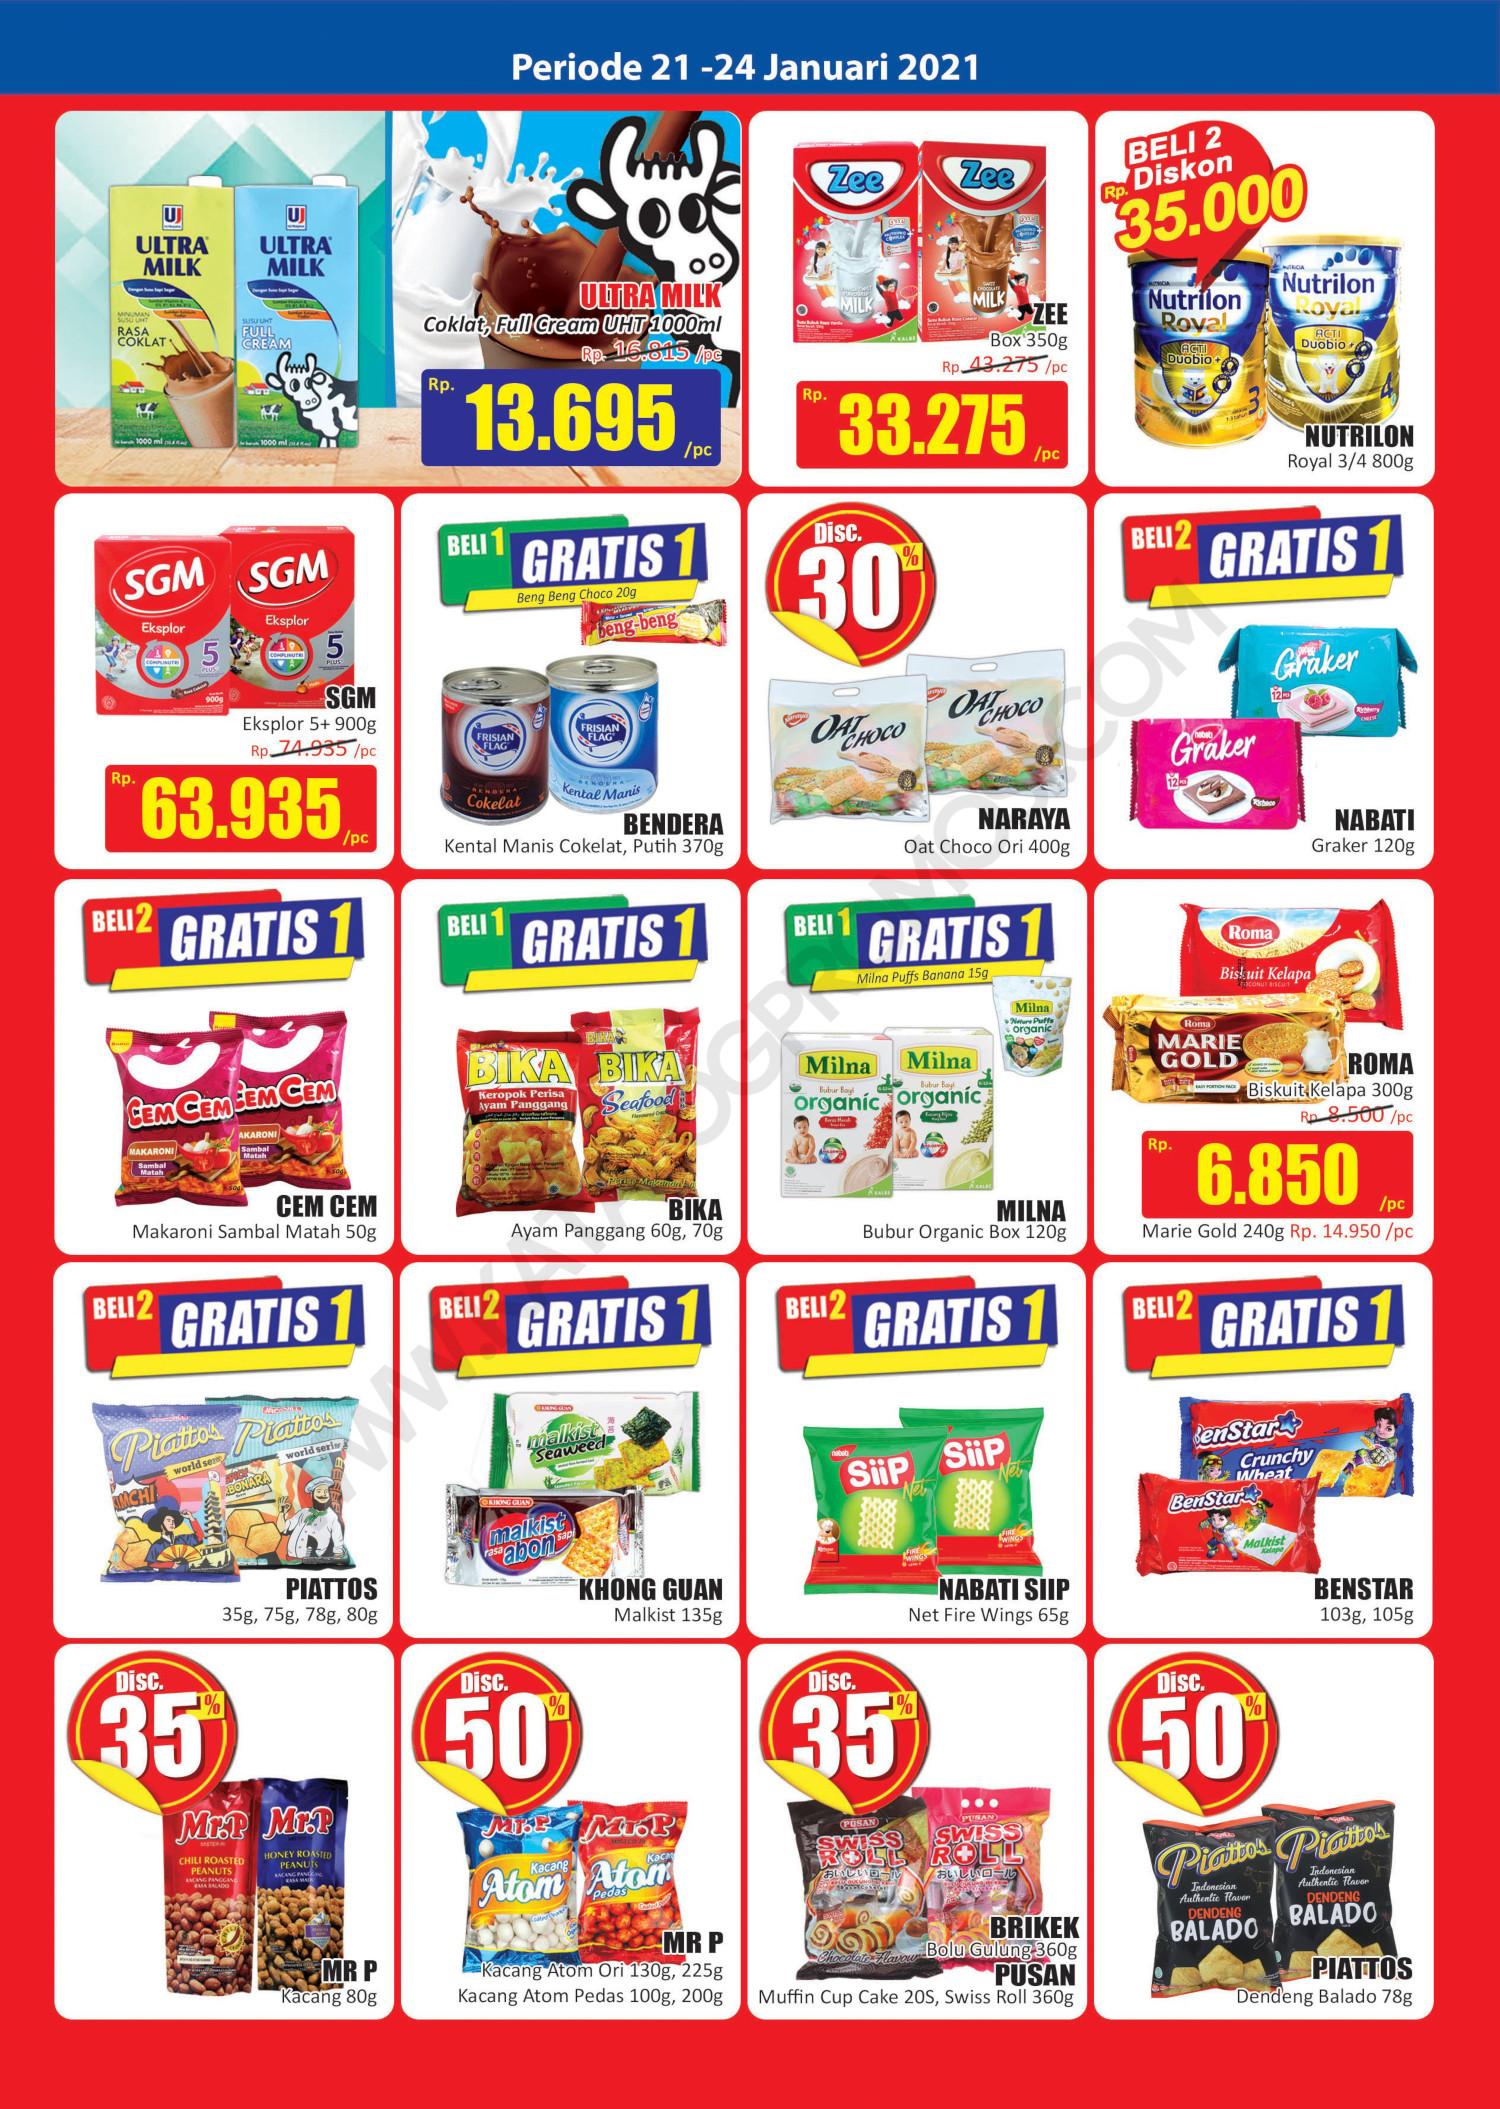 Katalog Promo Hari Hari Pasar Swalayan Weekend Periode 21-24 Januari 2021